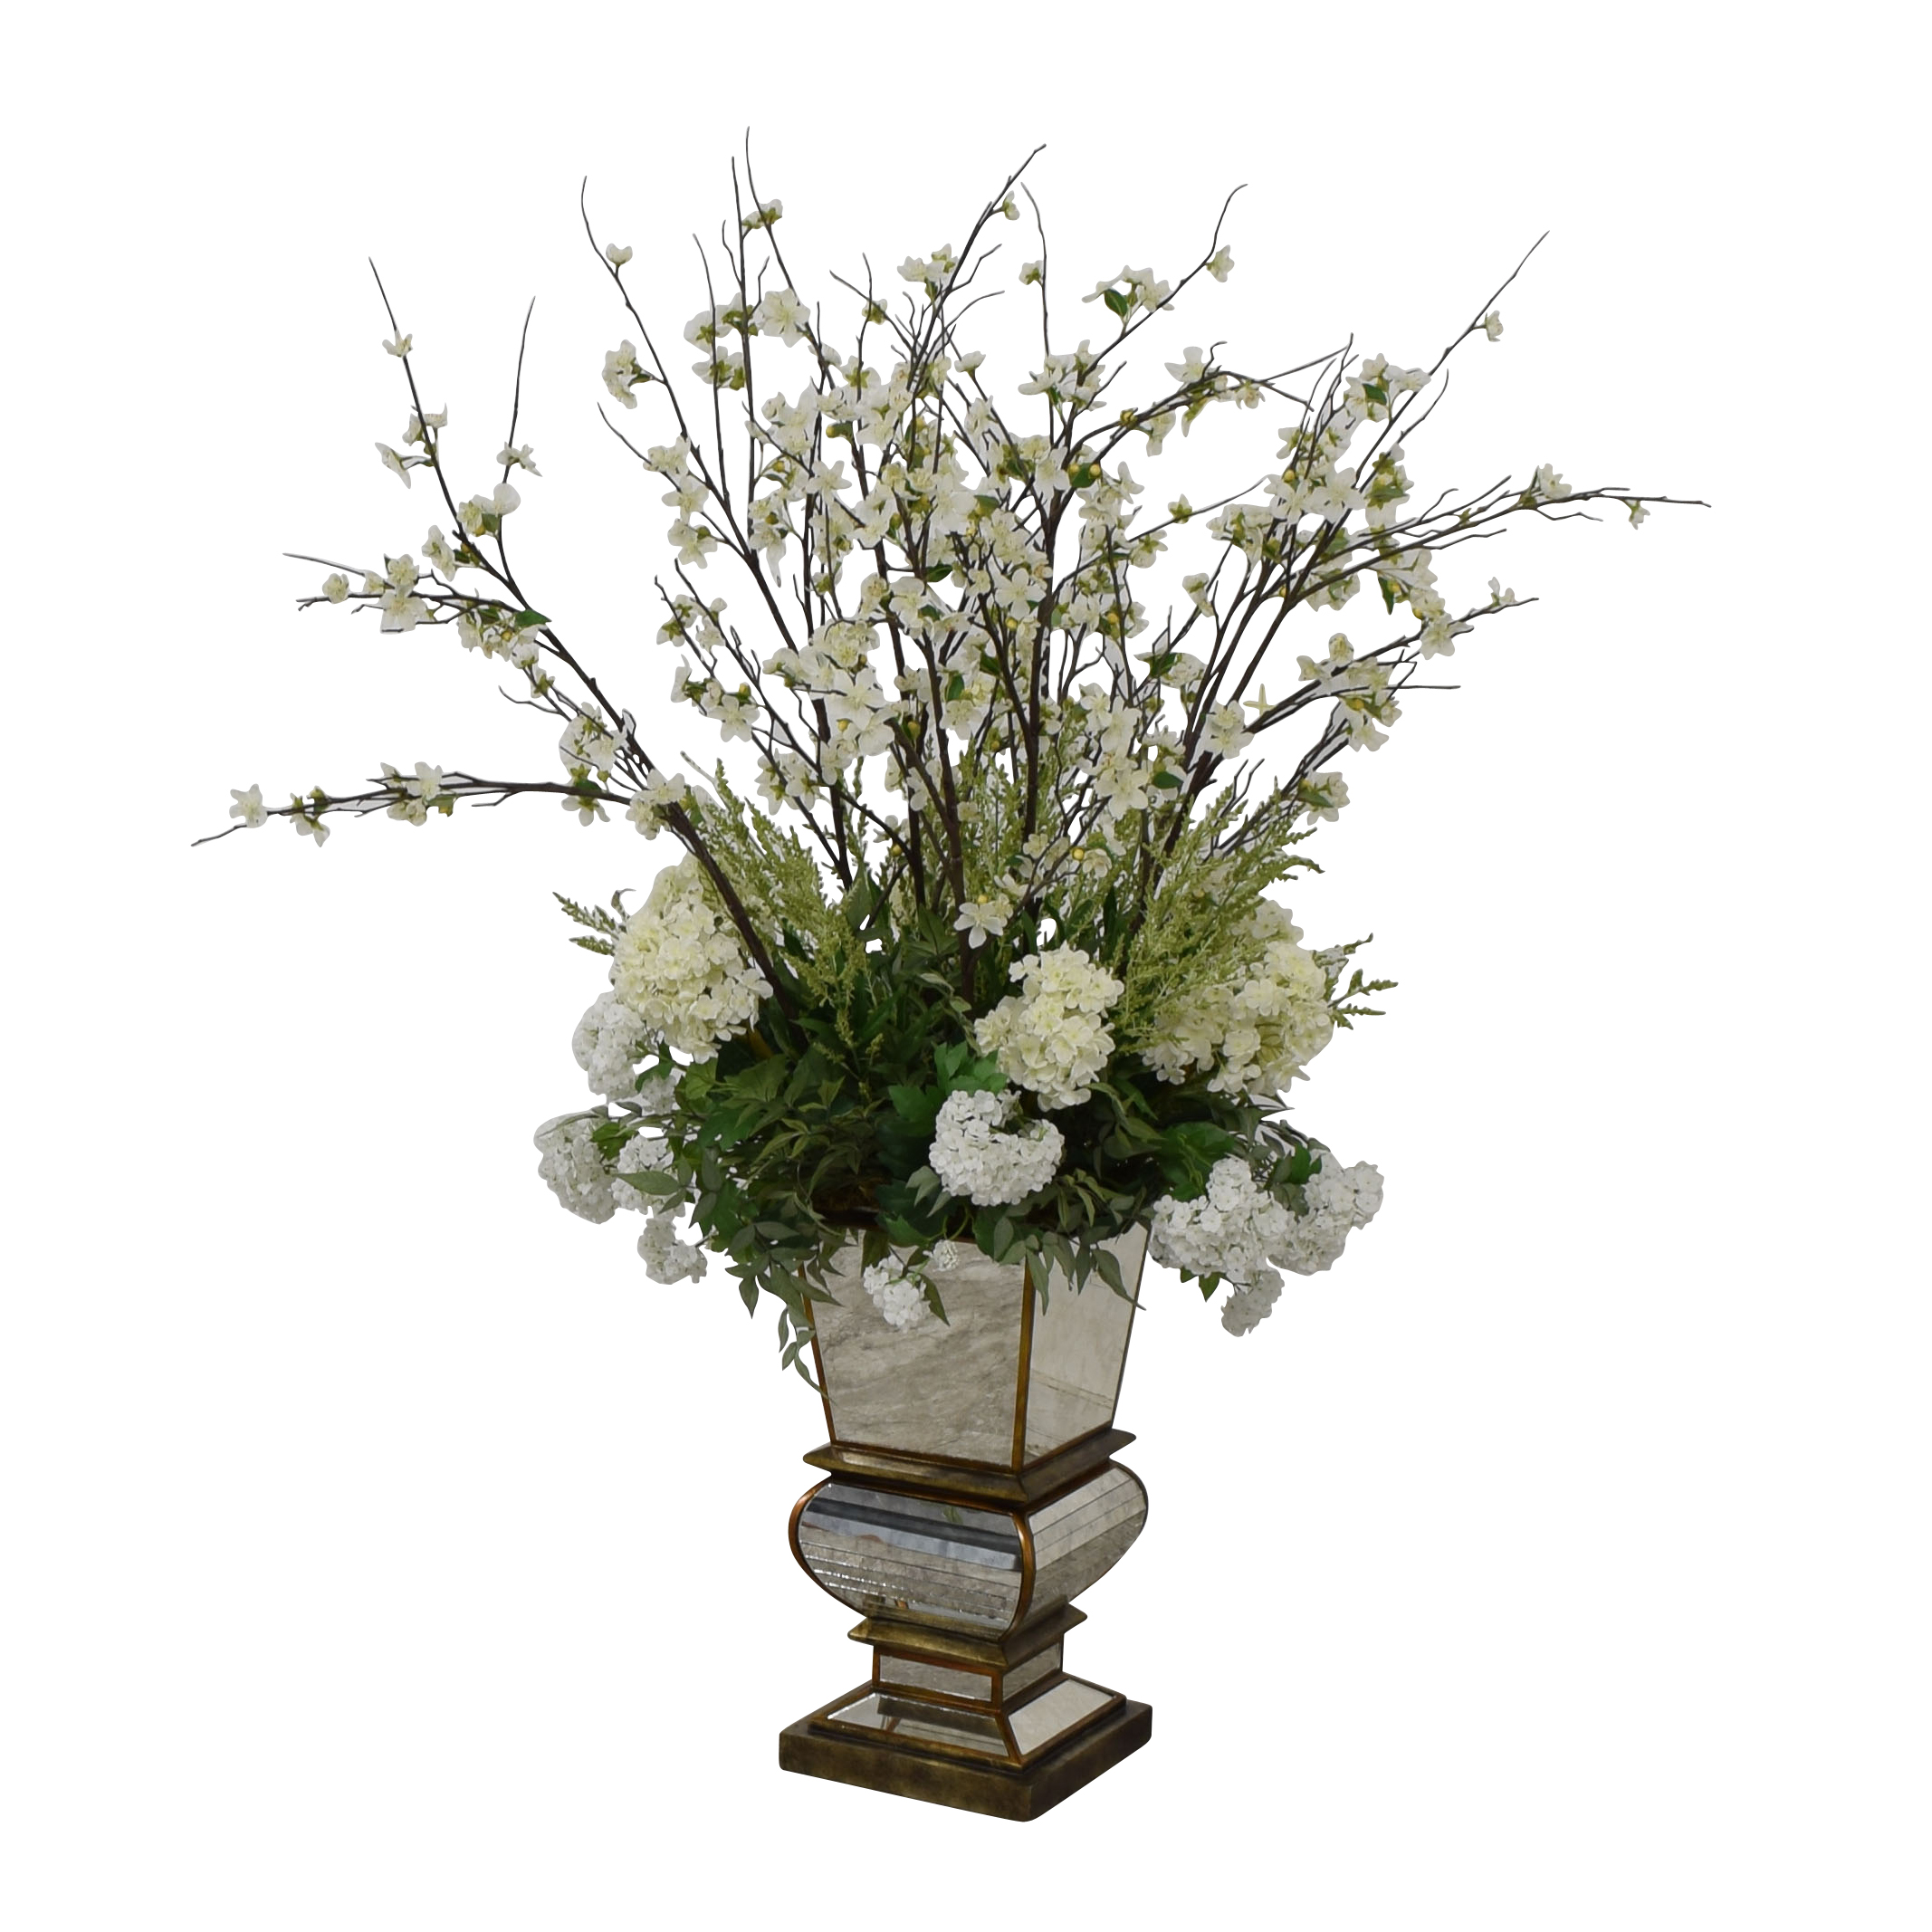 Jonathan-Richard Jonathan-Richard White Flowers in Mirrored Base on sale